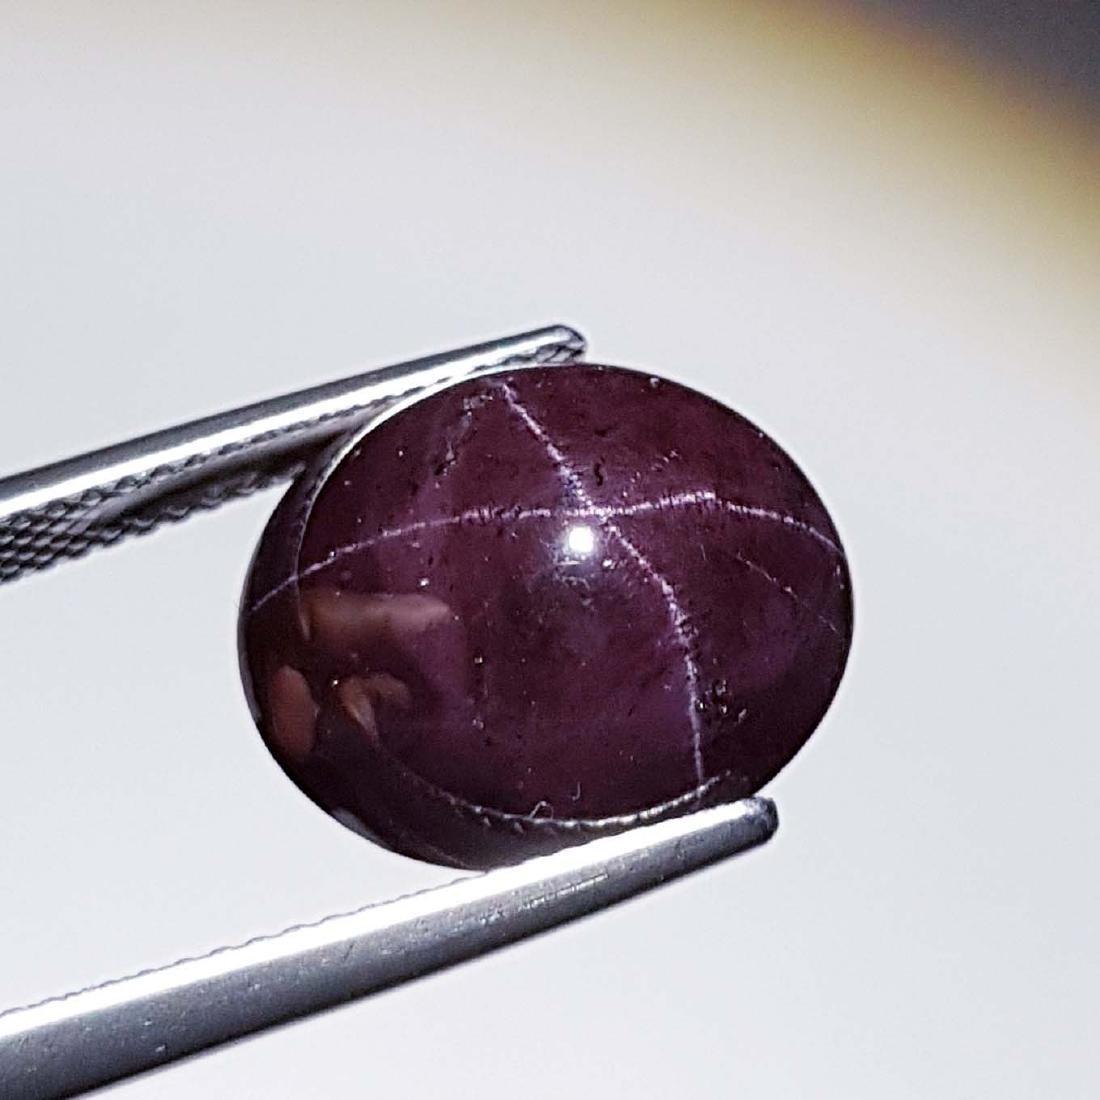 Natural Four Ray Star Garnet - 17.87 ct